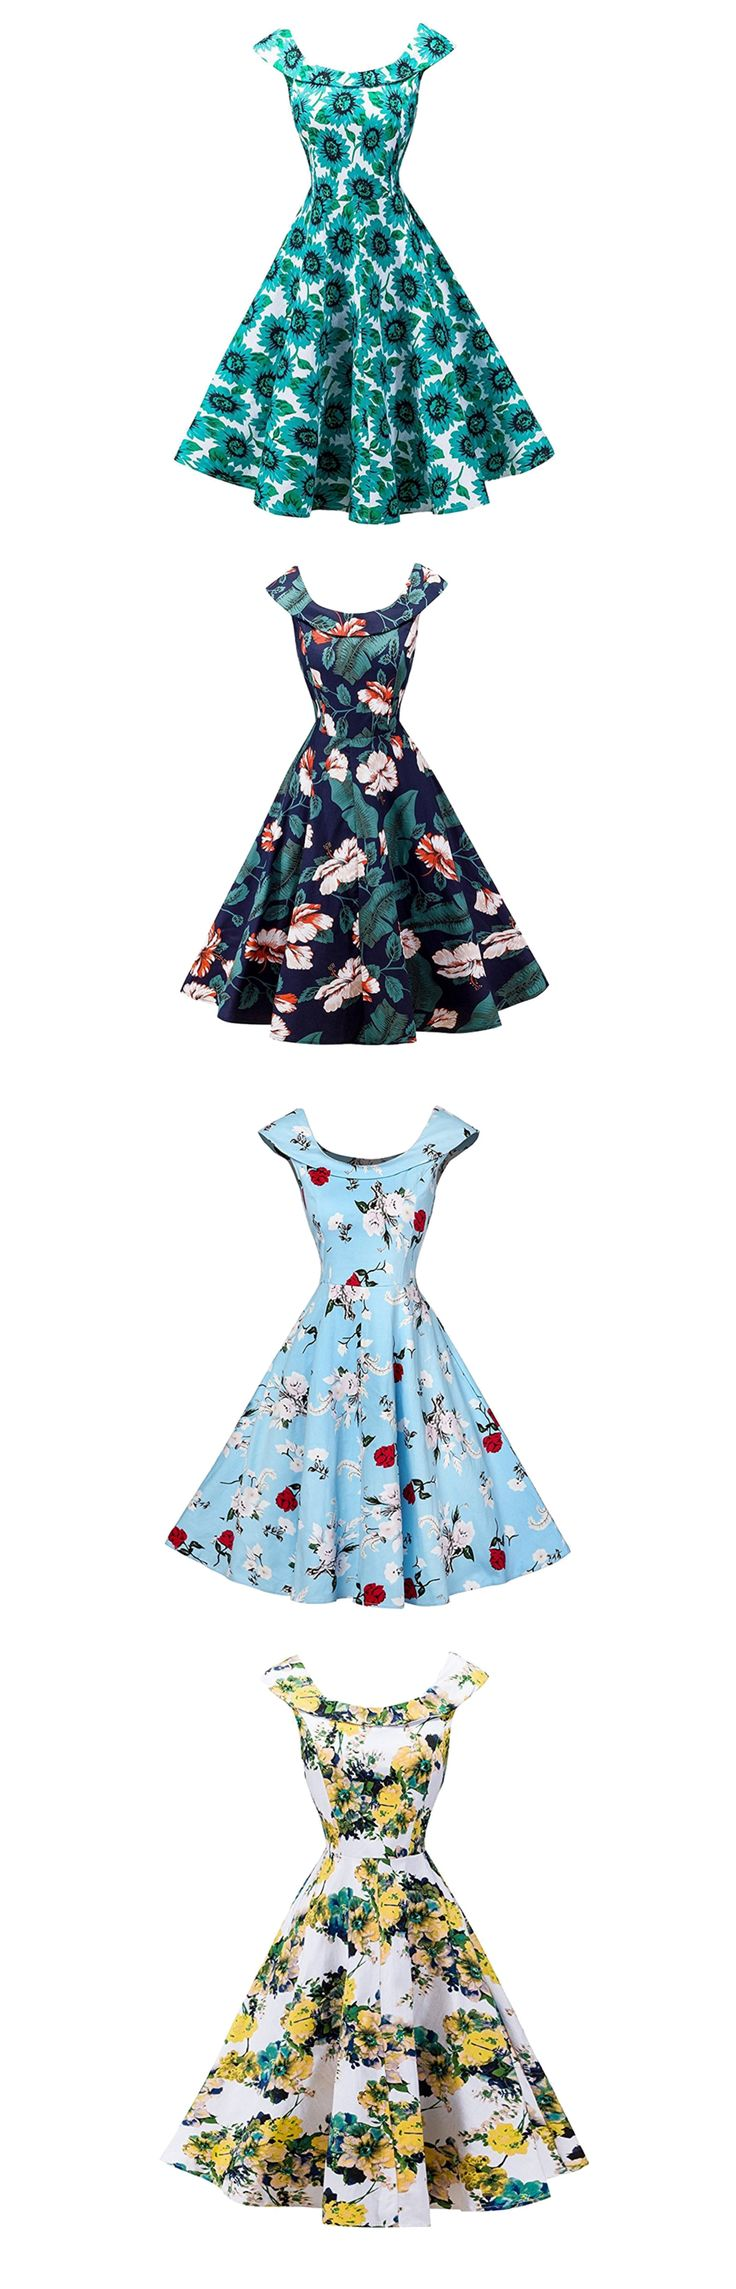 Cute bridesmaid dresses with a floral design in a 50s retro style boatneck dress - FitDesign Vintage Reto Swing Formal Dresses Polka Dots Skull Cocktail Party Cap Sleeves - https://www.amazon.com/FitDesign-Vintage-Dresses-Cocktail-Sleeves/dp/B072PHQBZ6/ref=as_li_ss_tl?s=apparel&ie=UTF8&qid=1506108122&sr=1-91&nodeID=11006703011&psd=1&linkCode=ll1&tag=theweddingclu-20&linkId=8ad13c9b95804c3f72216a9451fe7708